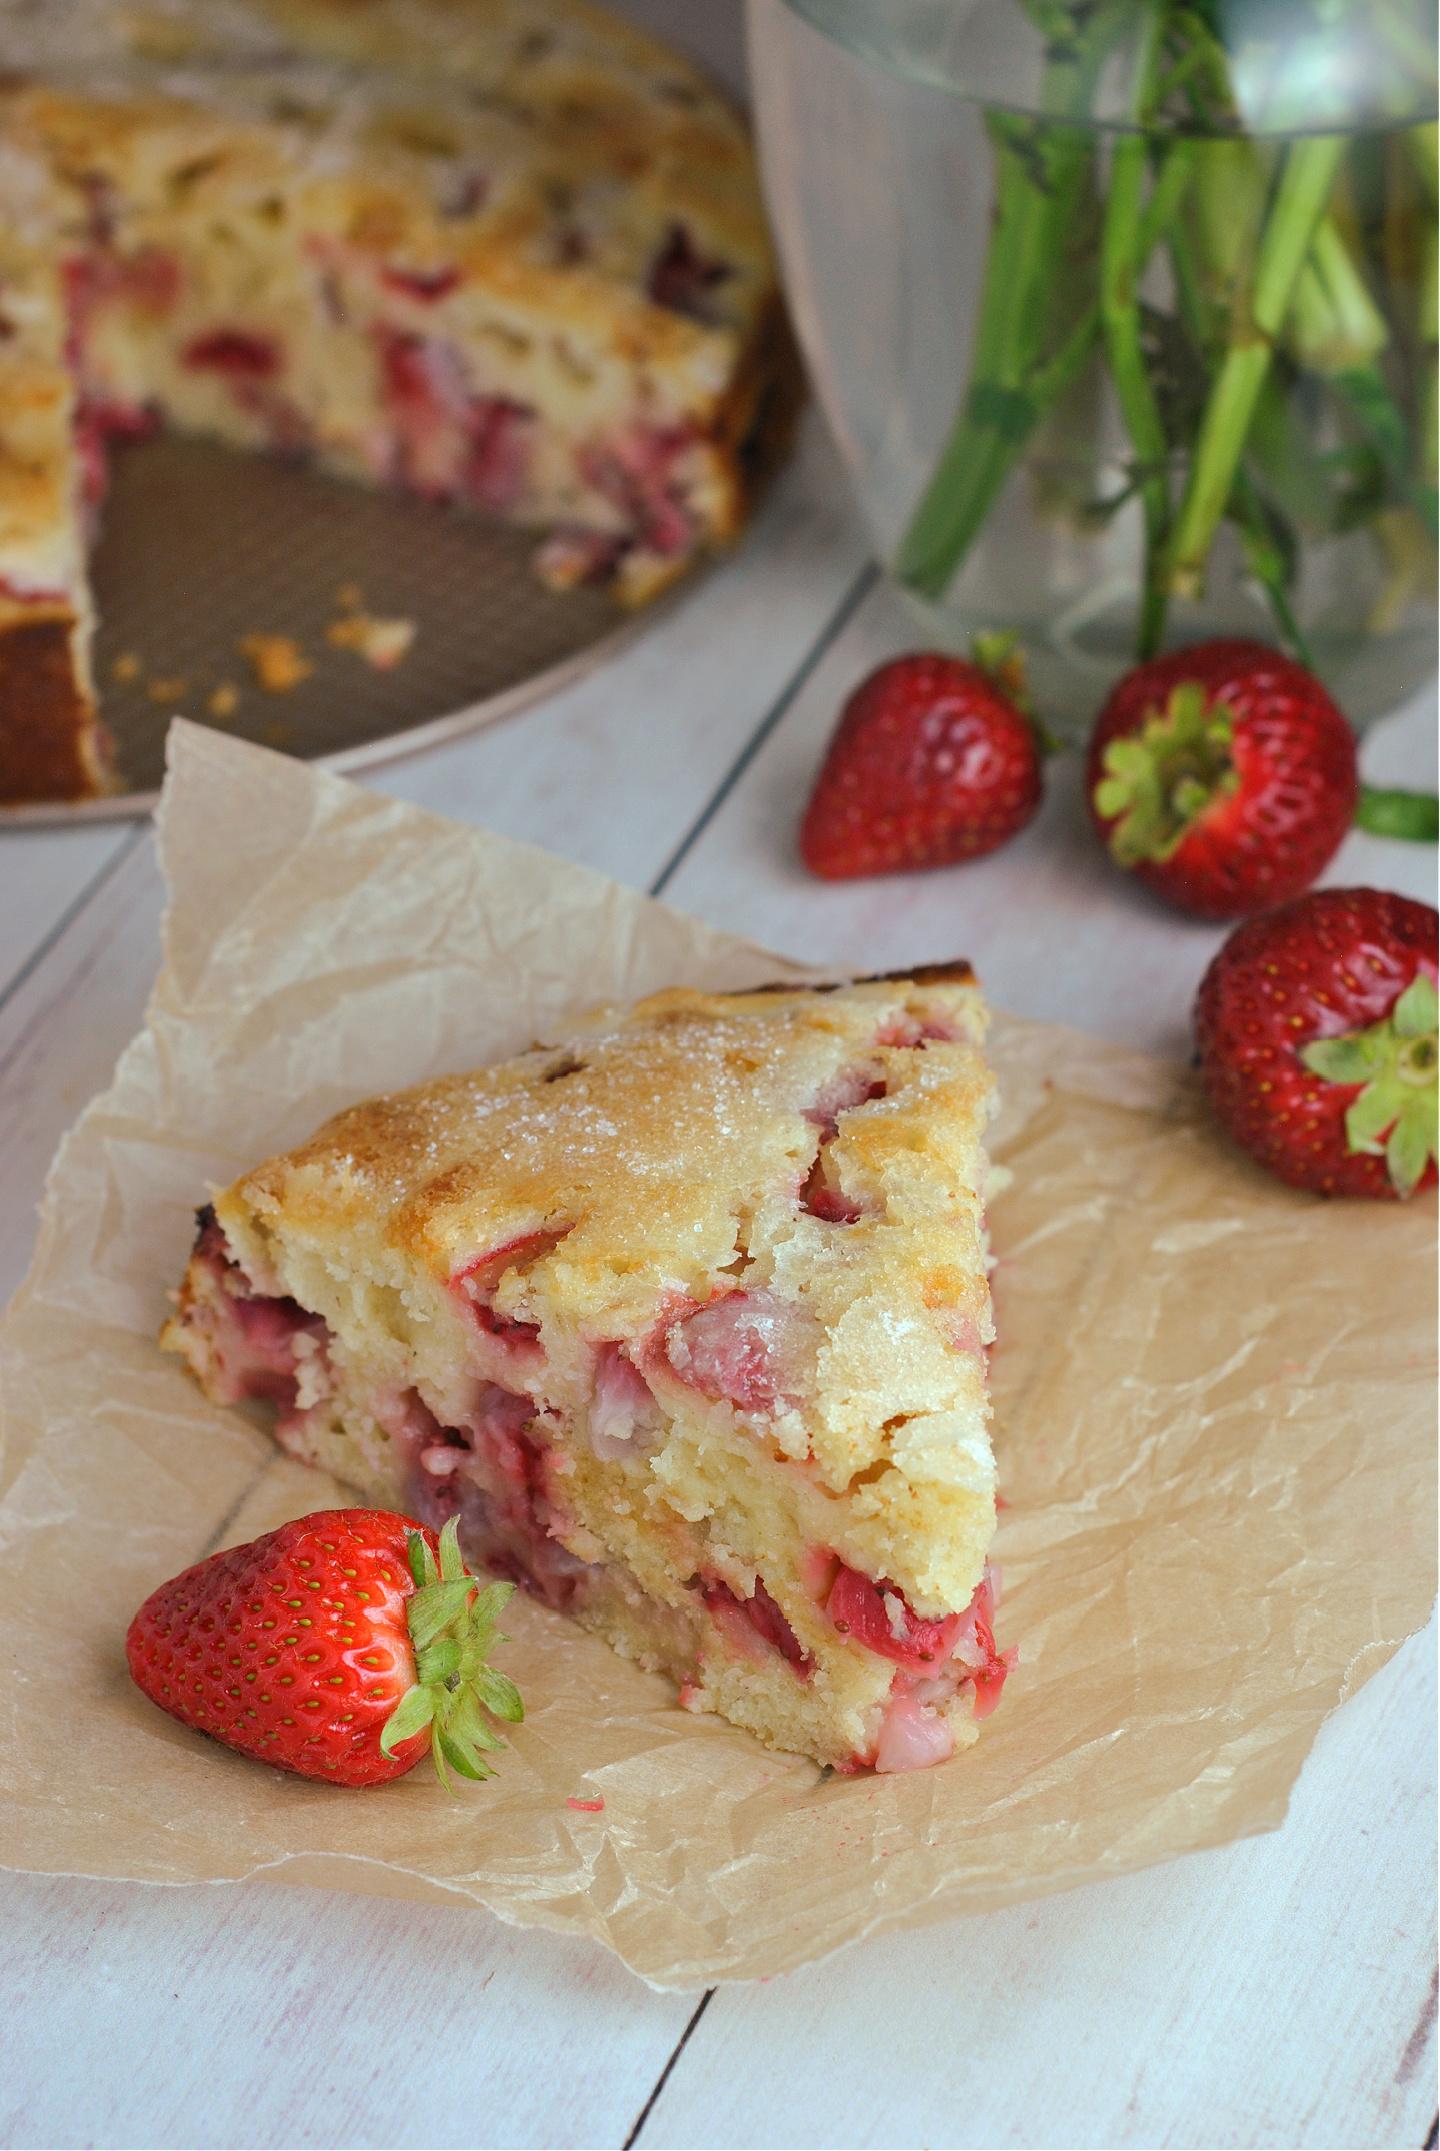 Strawberry Buttermilk Cake via @preventionrd